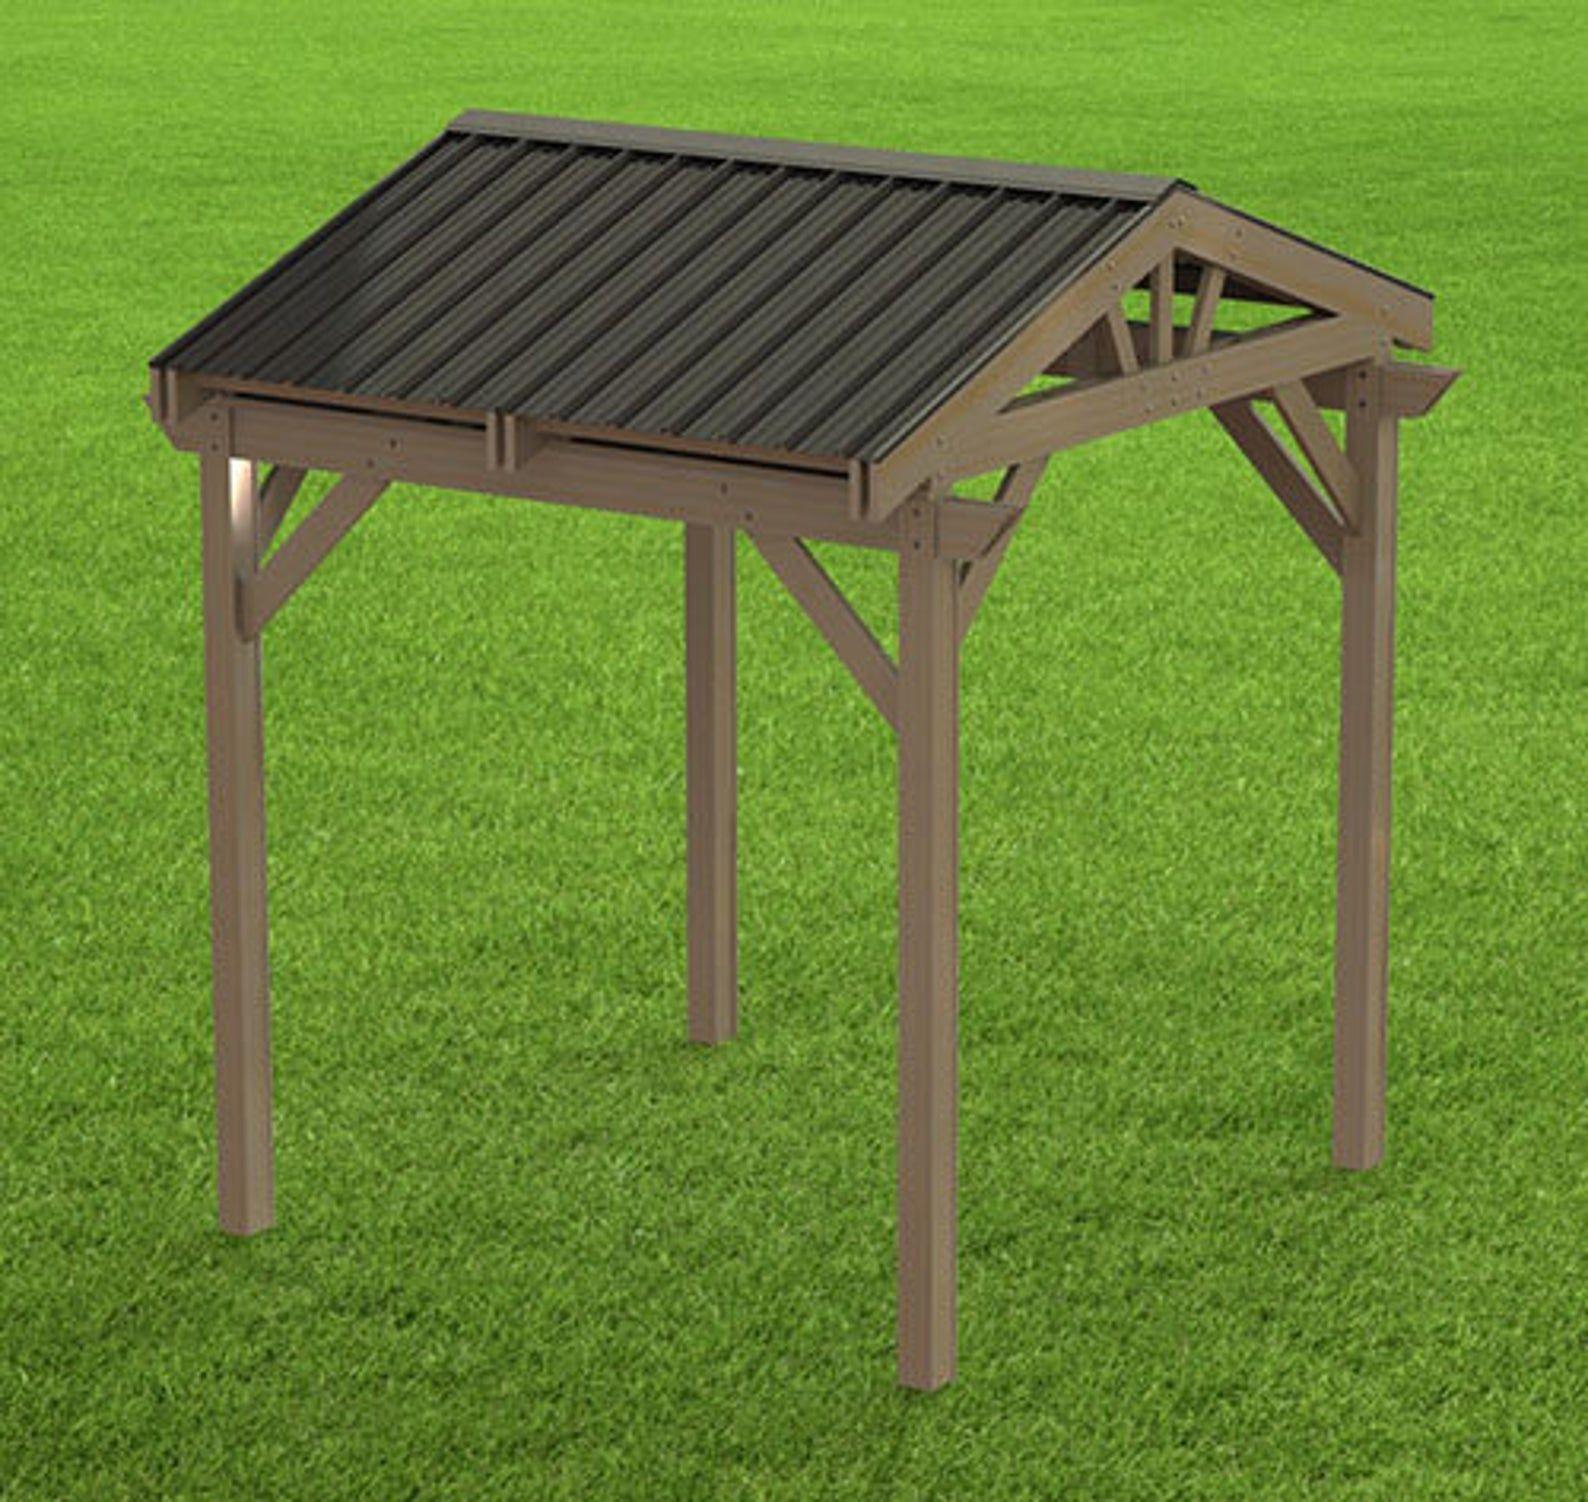 Gable Steel Roof Gazebo Building Plans 10 X 10 Etsy In 2021 Hot Tub Gazebo Gazebo Plans Grill Gazebo